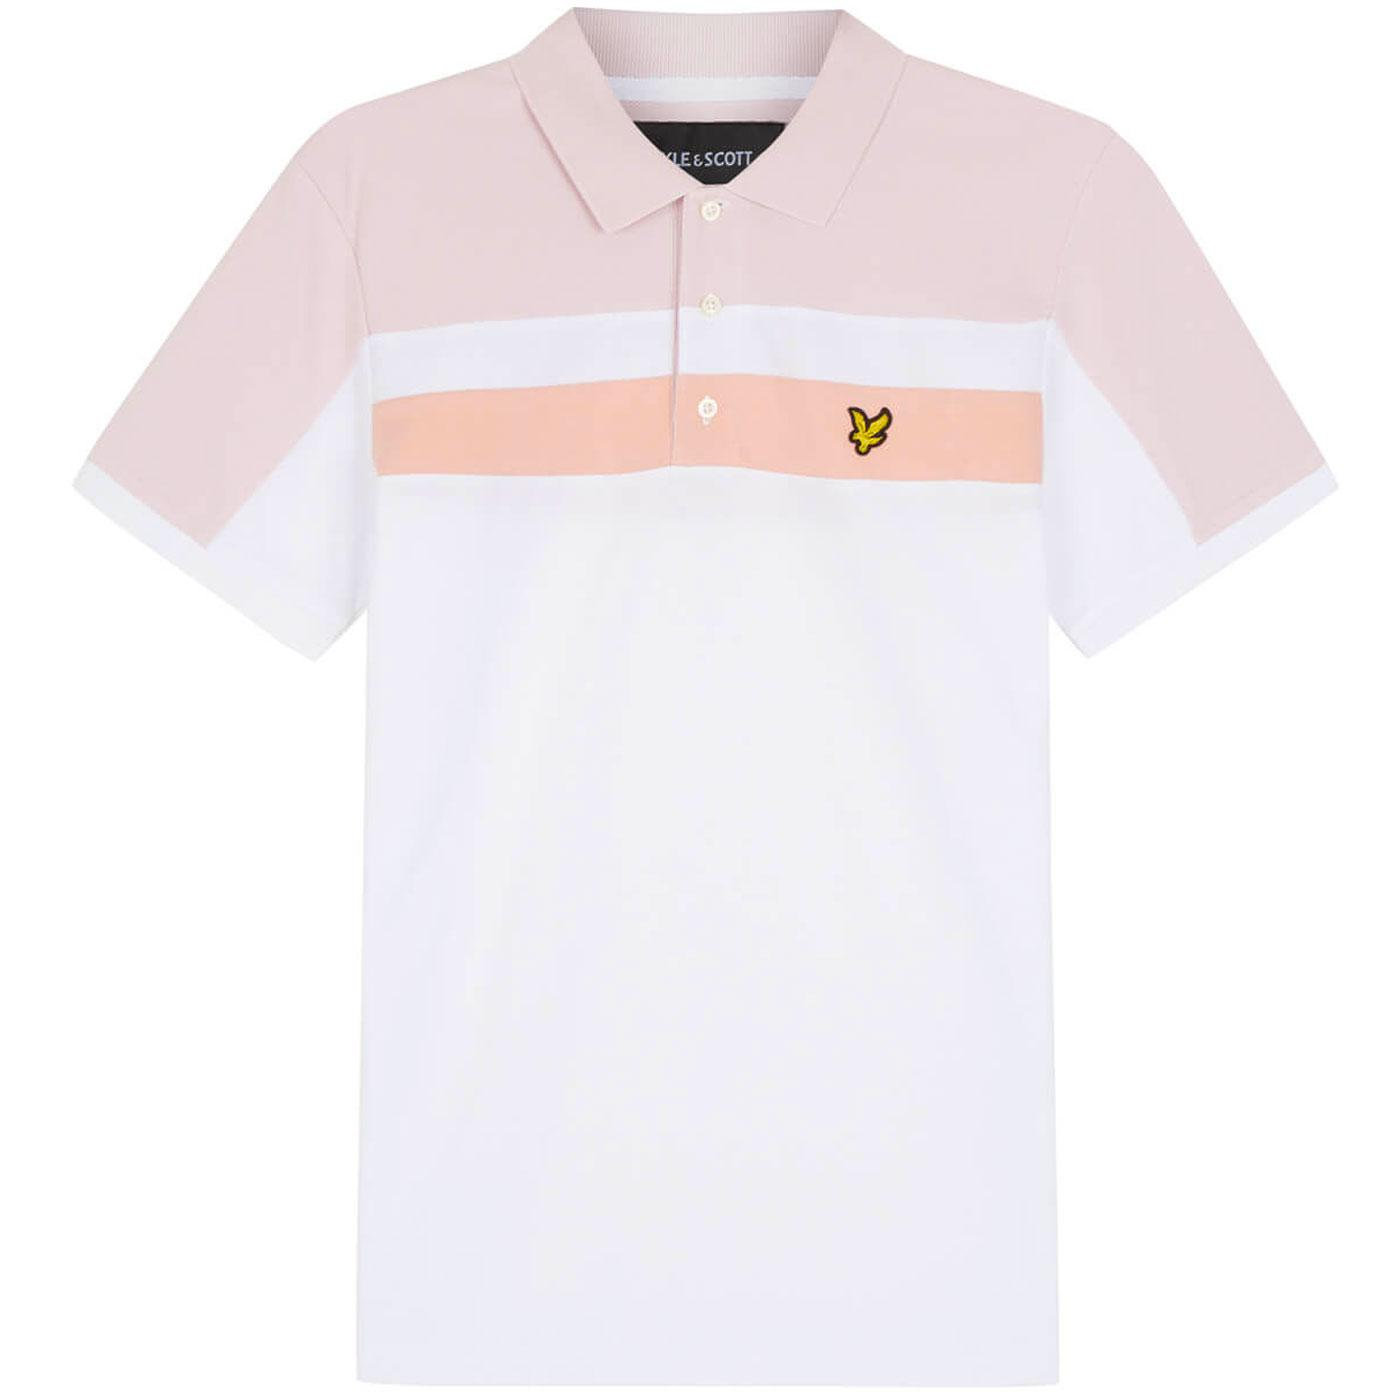 LYLE & SCOTT 70s Mod Colour Block Polo White/Pink